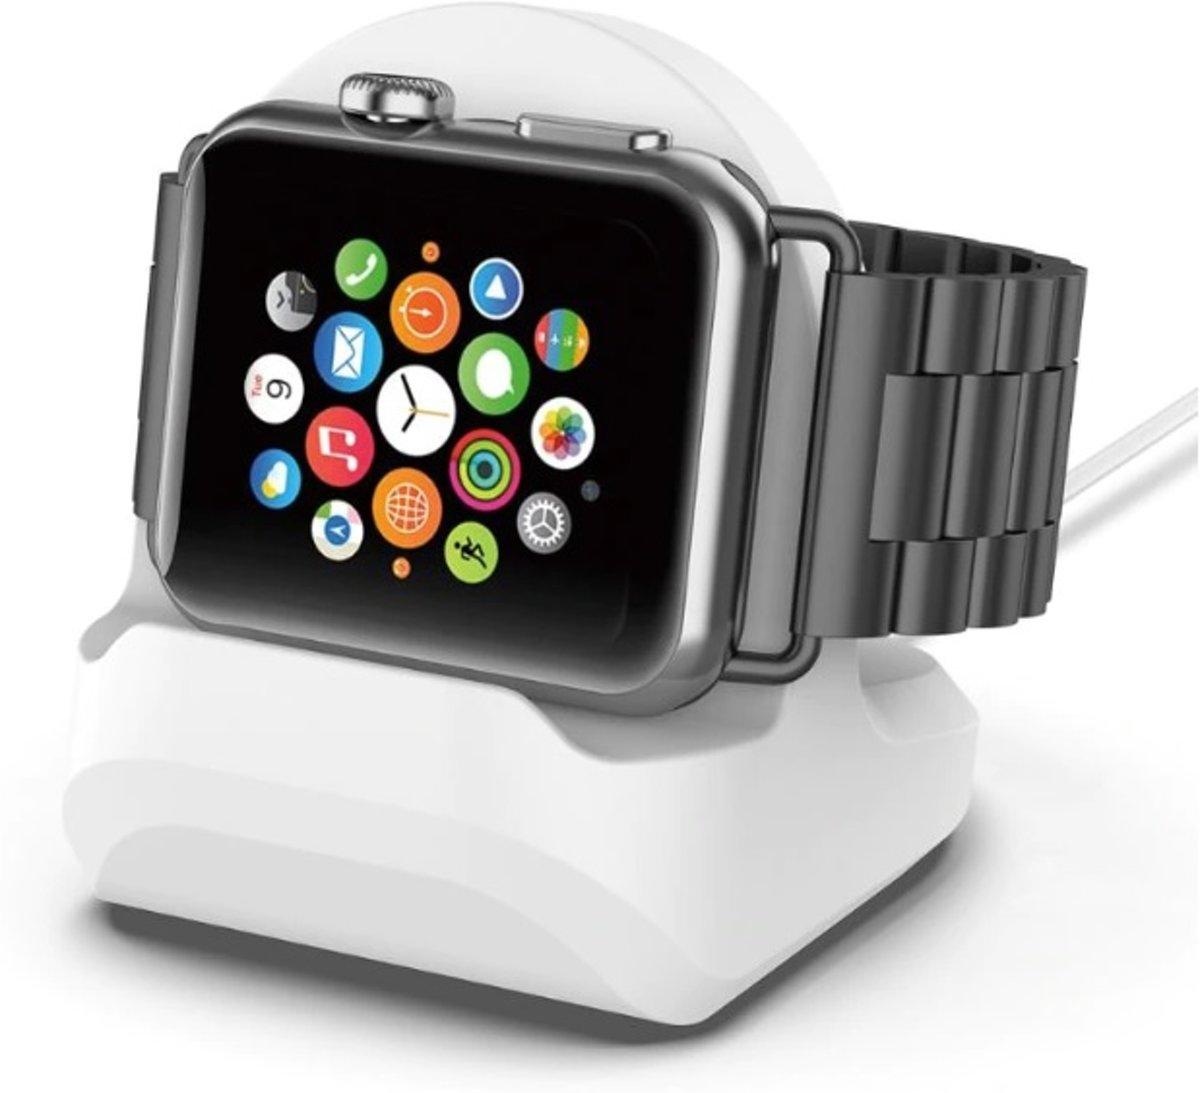 Apple Watch - Docking station - Houder - Tafelhouder - Universeel alle modellen - WIT kopen